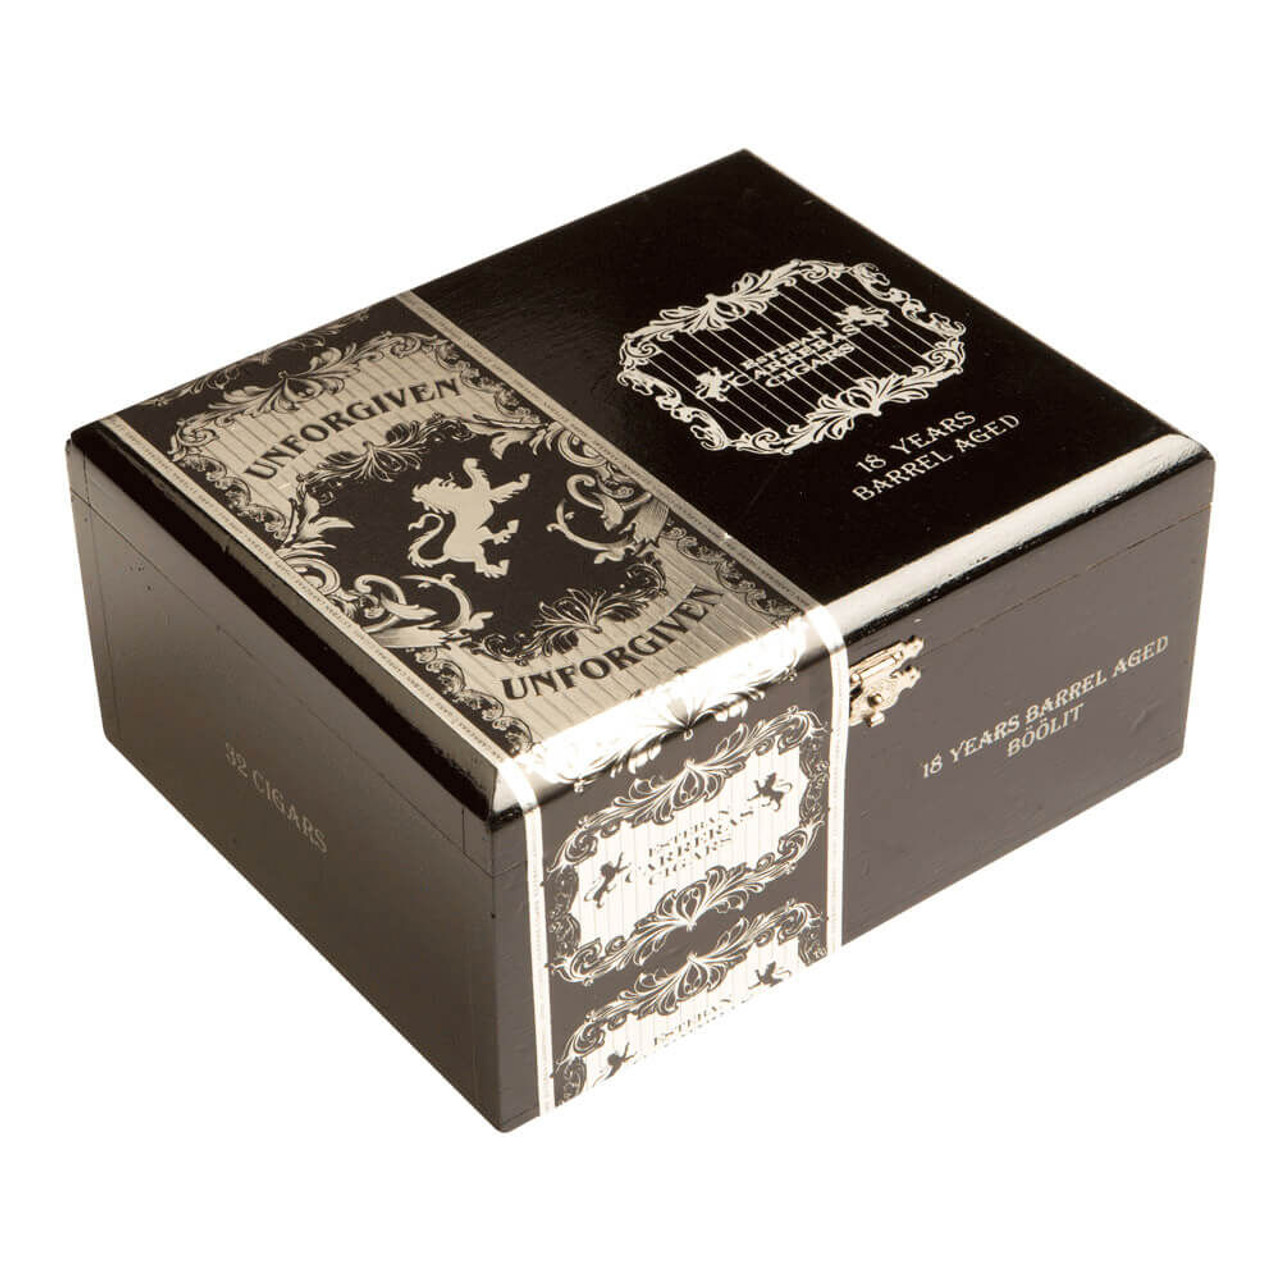 Esteban Carreras Unforgiven Boolit Cigars - 4.75 x 46 (Box of 32)